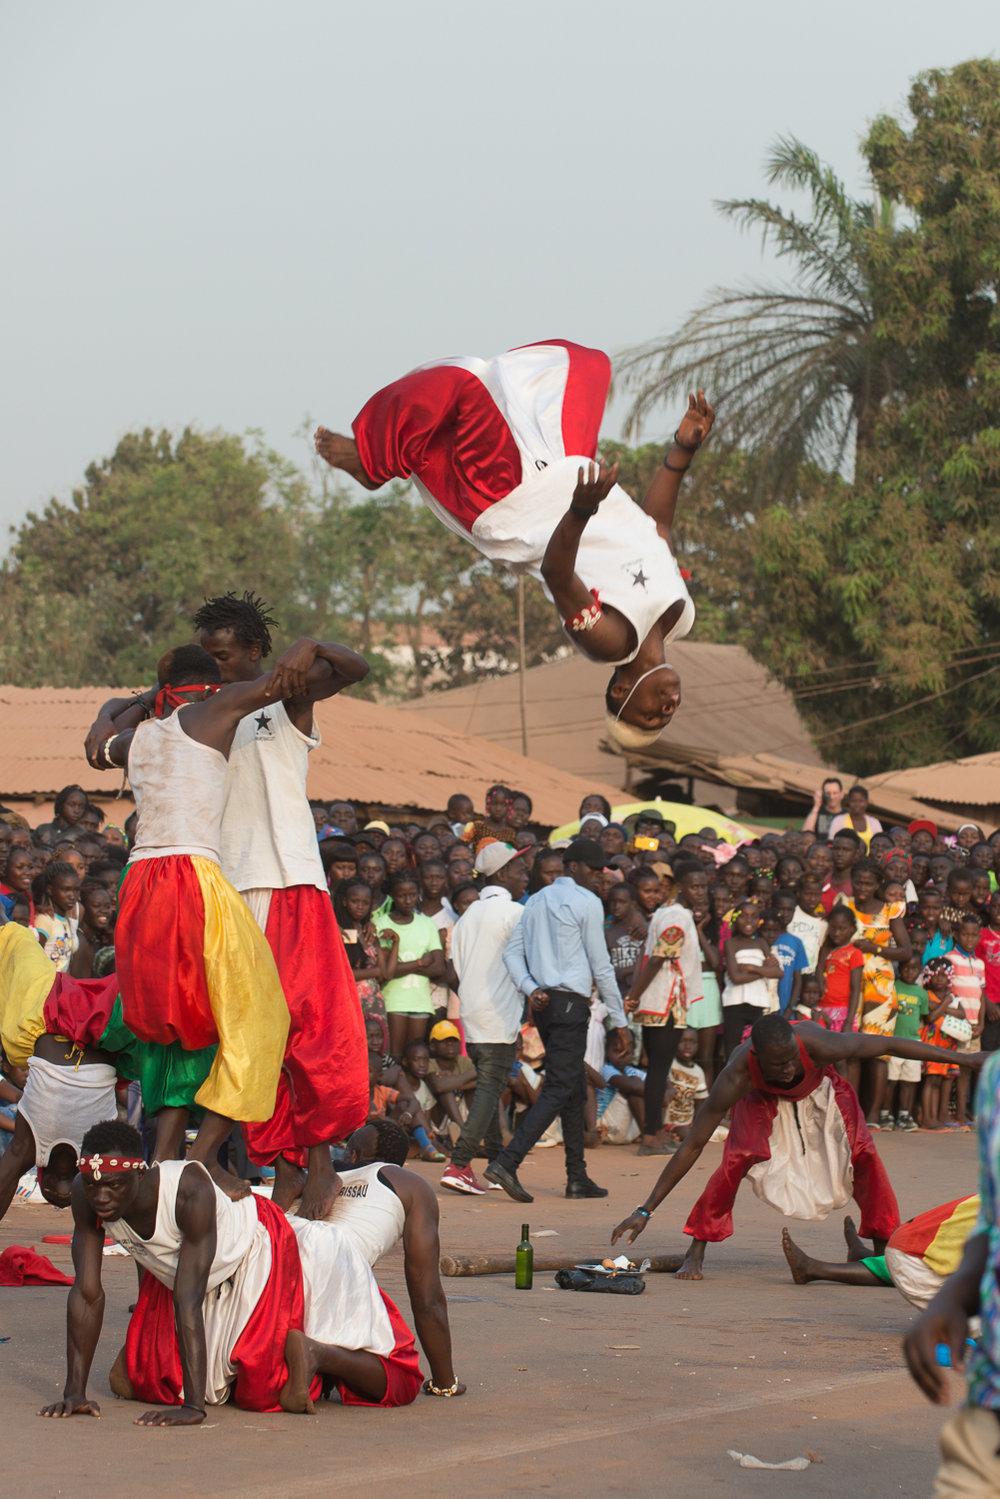 2018_02_Guinea-Bissau_Carnaval_Antula_NetosAntula_0034.jpg